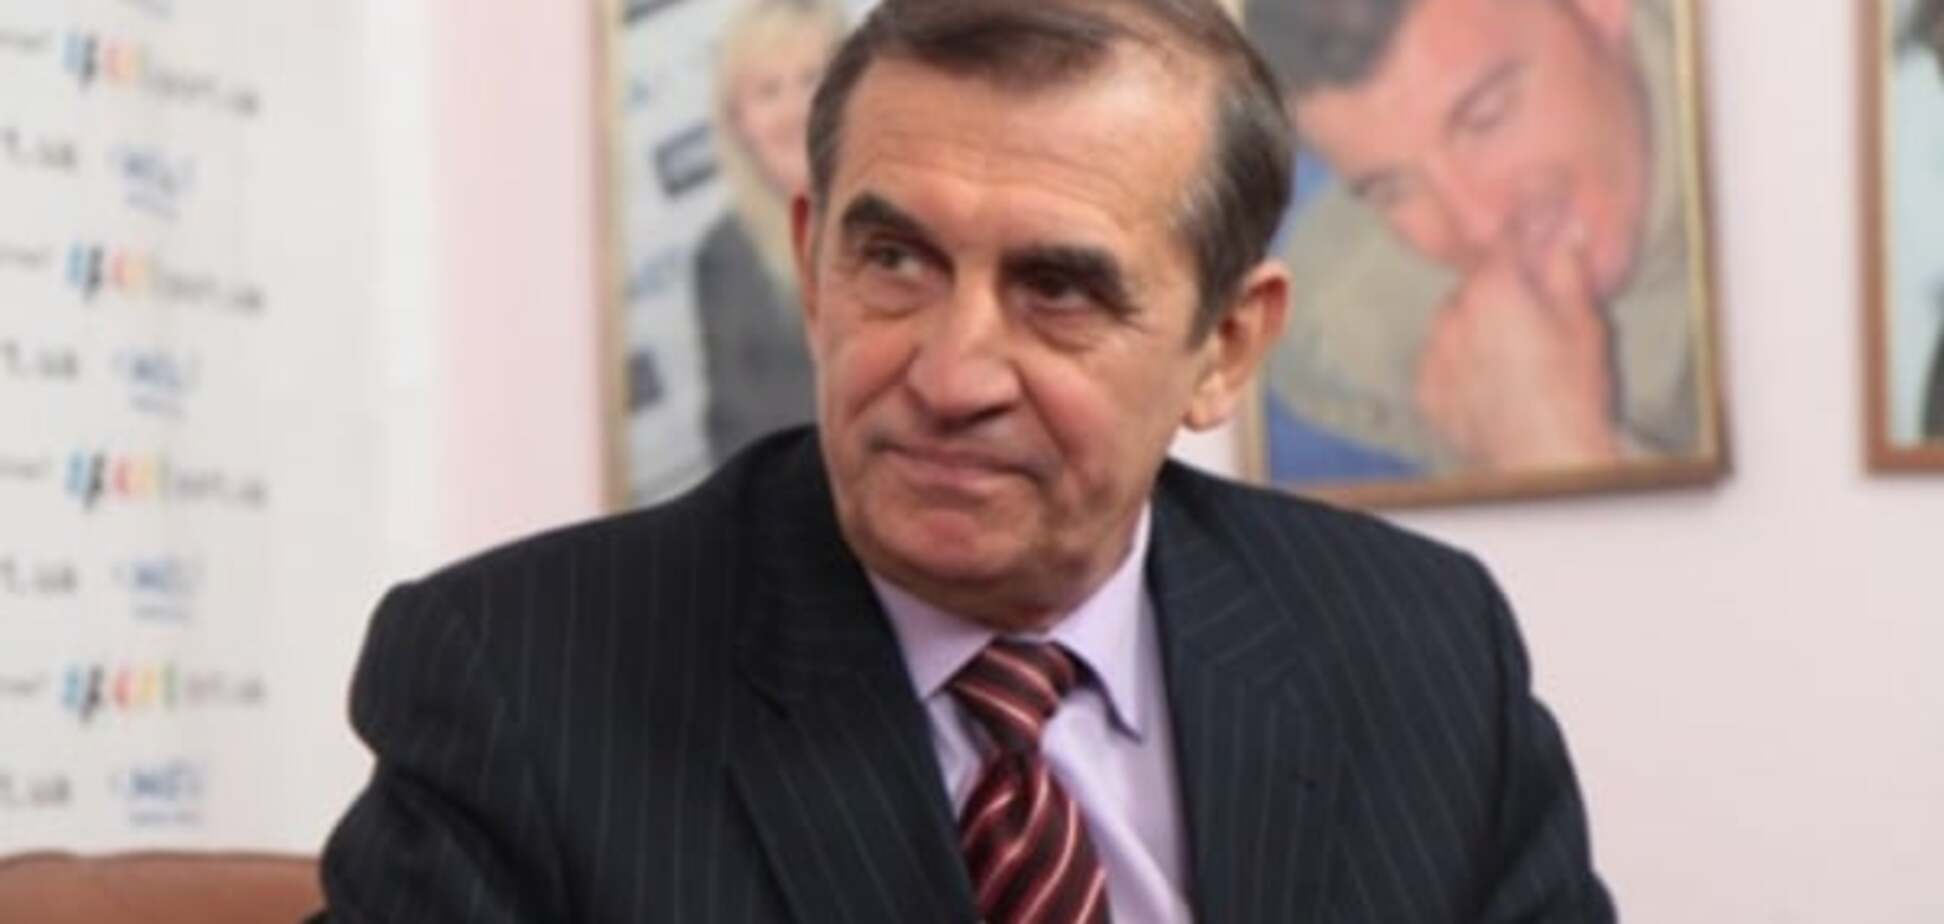 Комедия и позор: легенда 'Динамо' жестко прошелся по команде Реброва